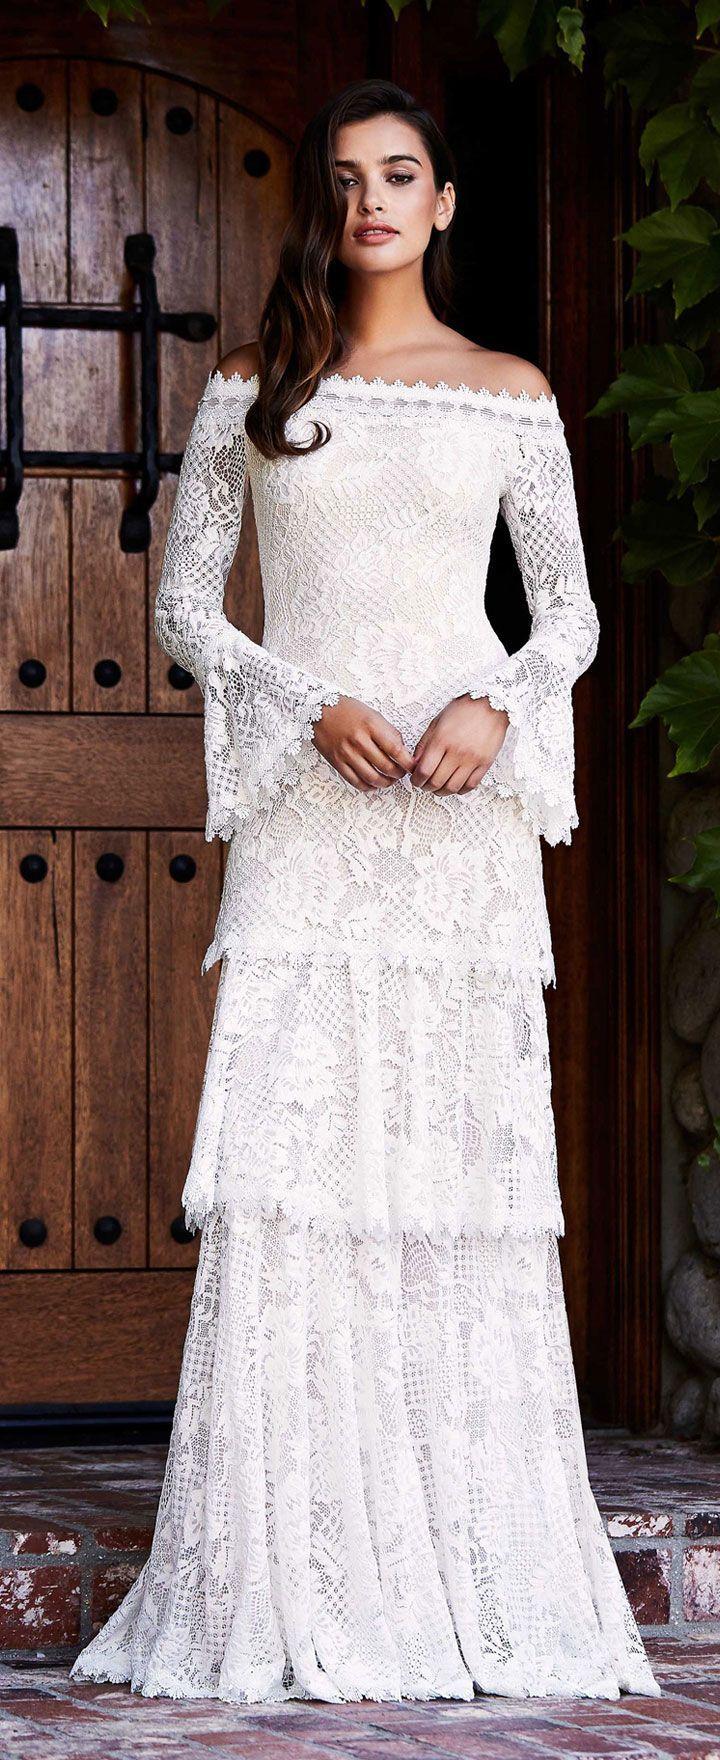 Off the shoulder long sleeves tiered wedding dress Tadashi Shoji bridal fall 2018 #weddingdress #wedding #weddinggown